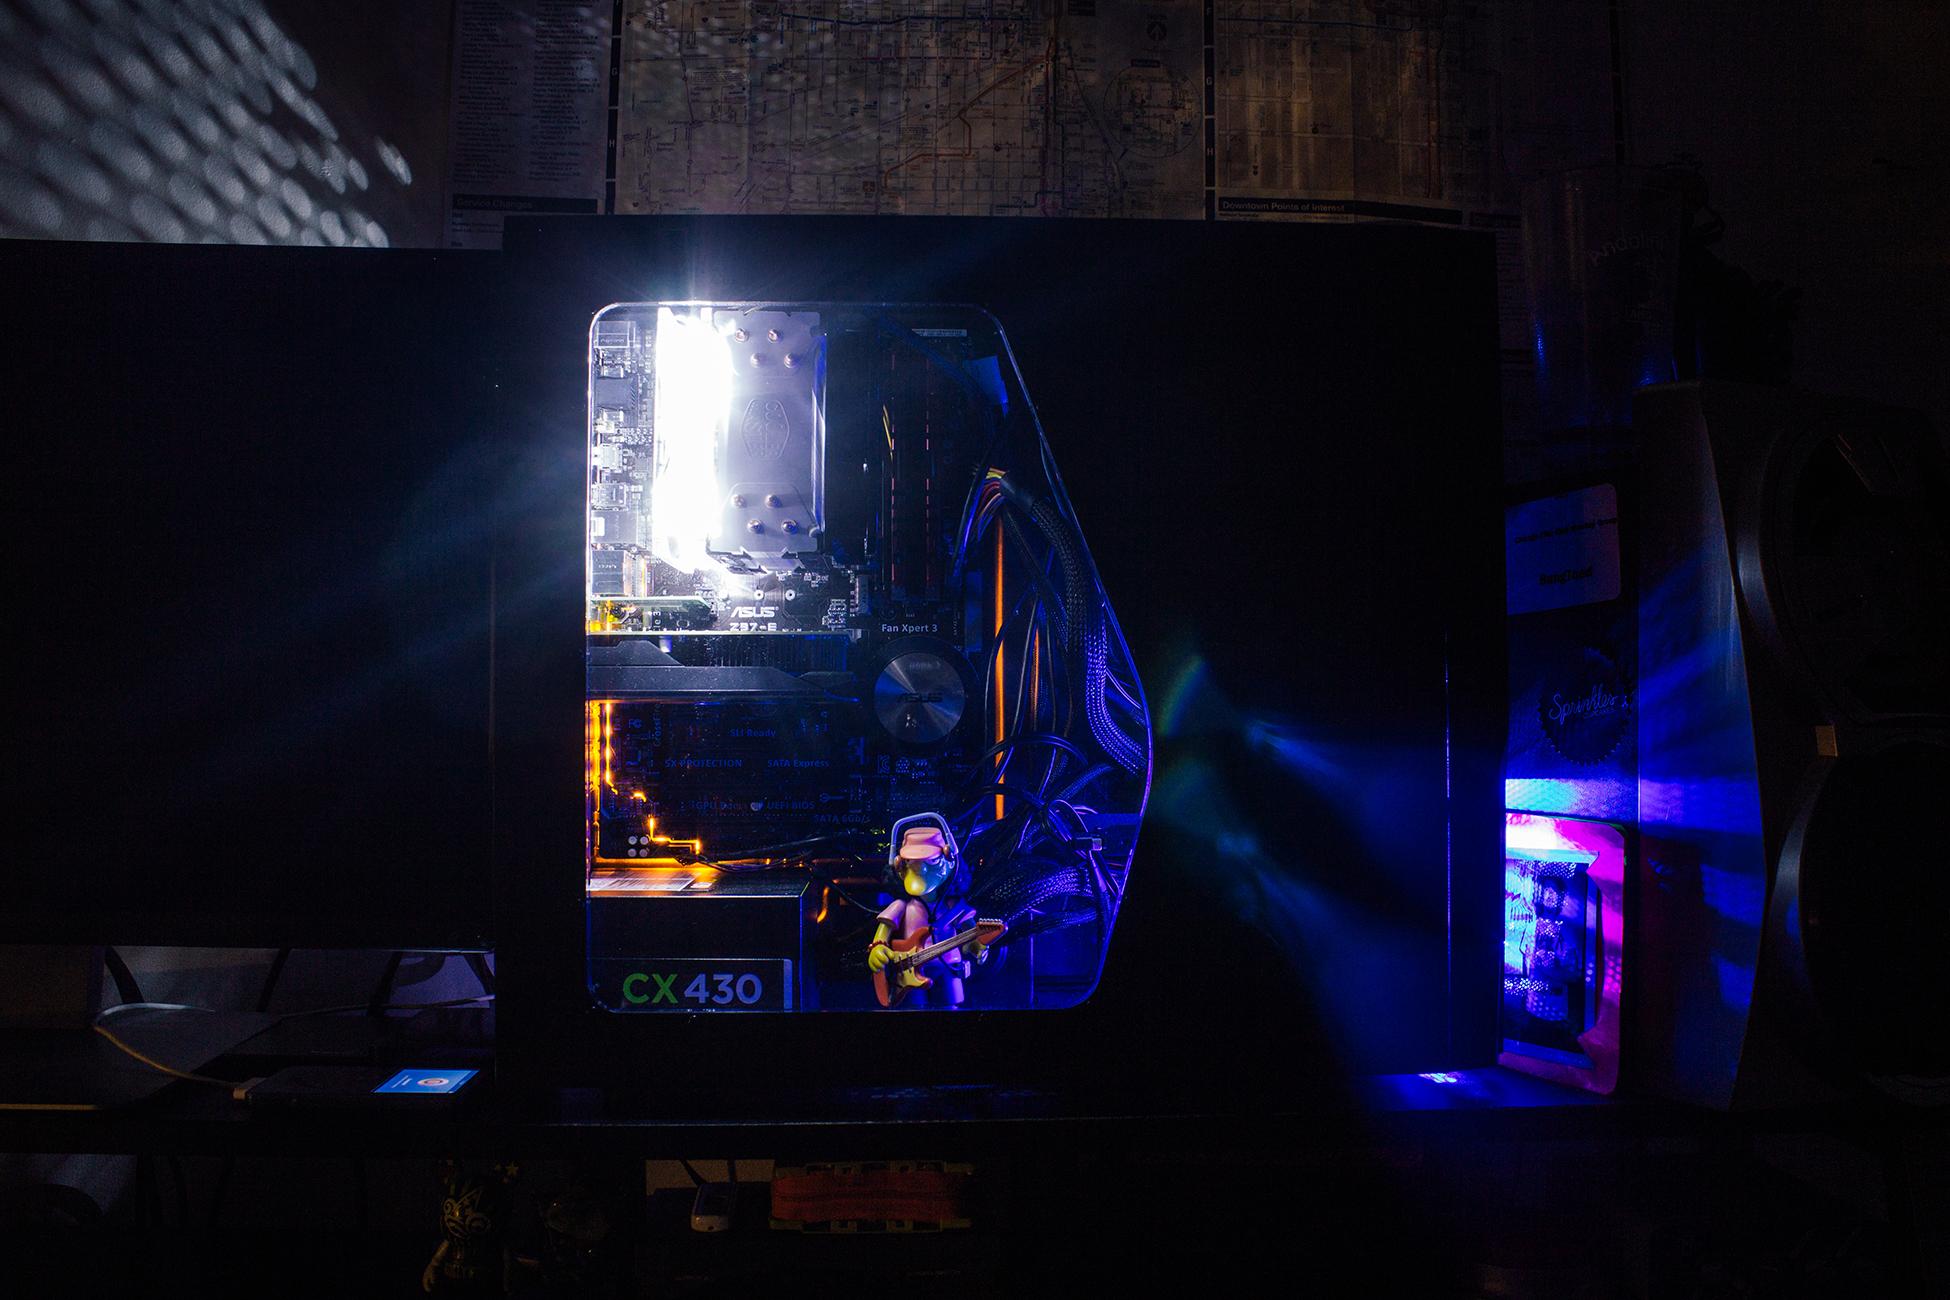 PC that I built